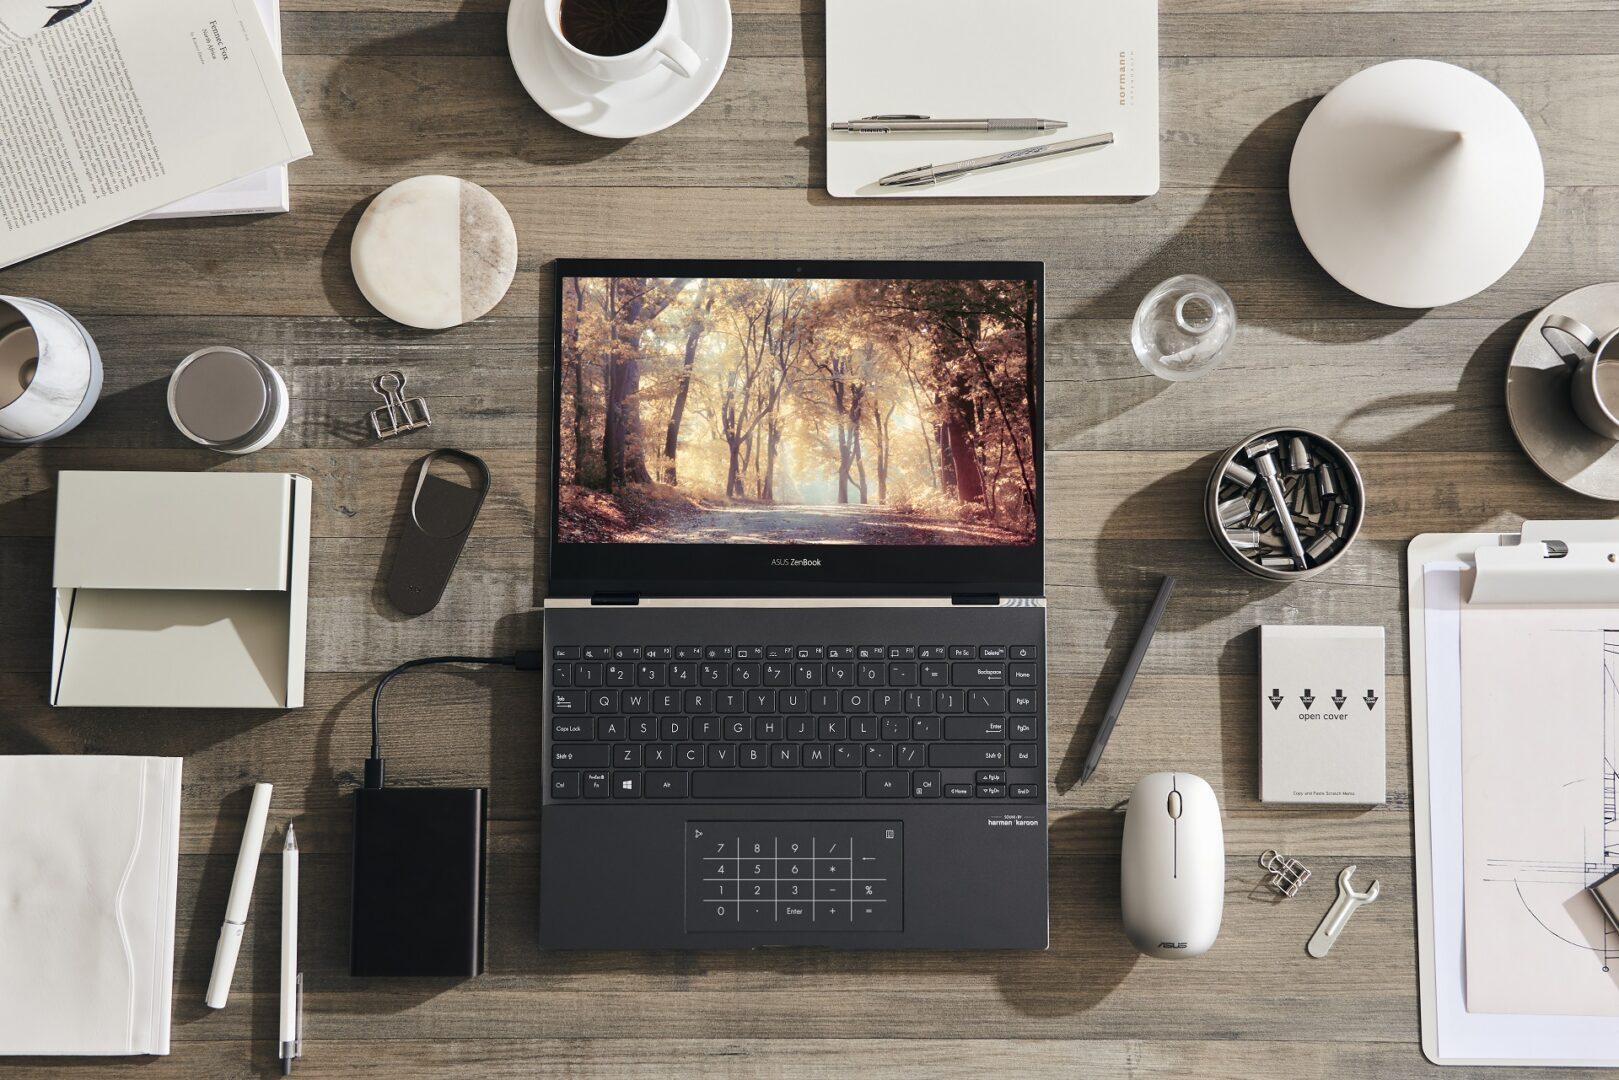 لاب توب ASUS ZenBook Flip 13 3